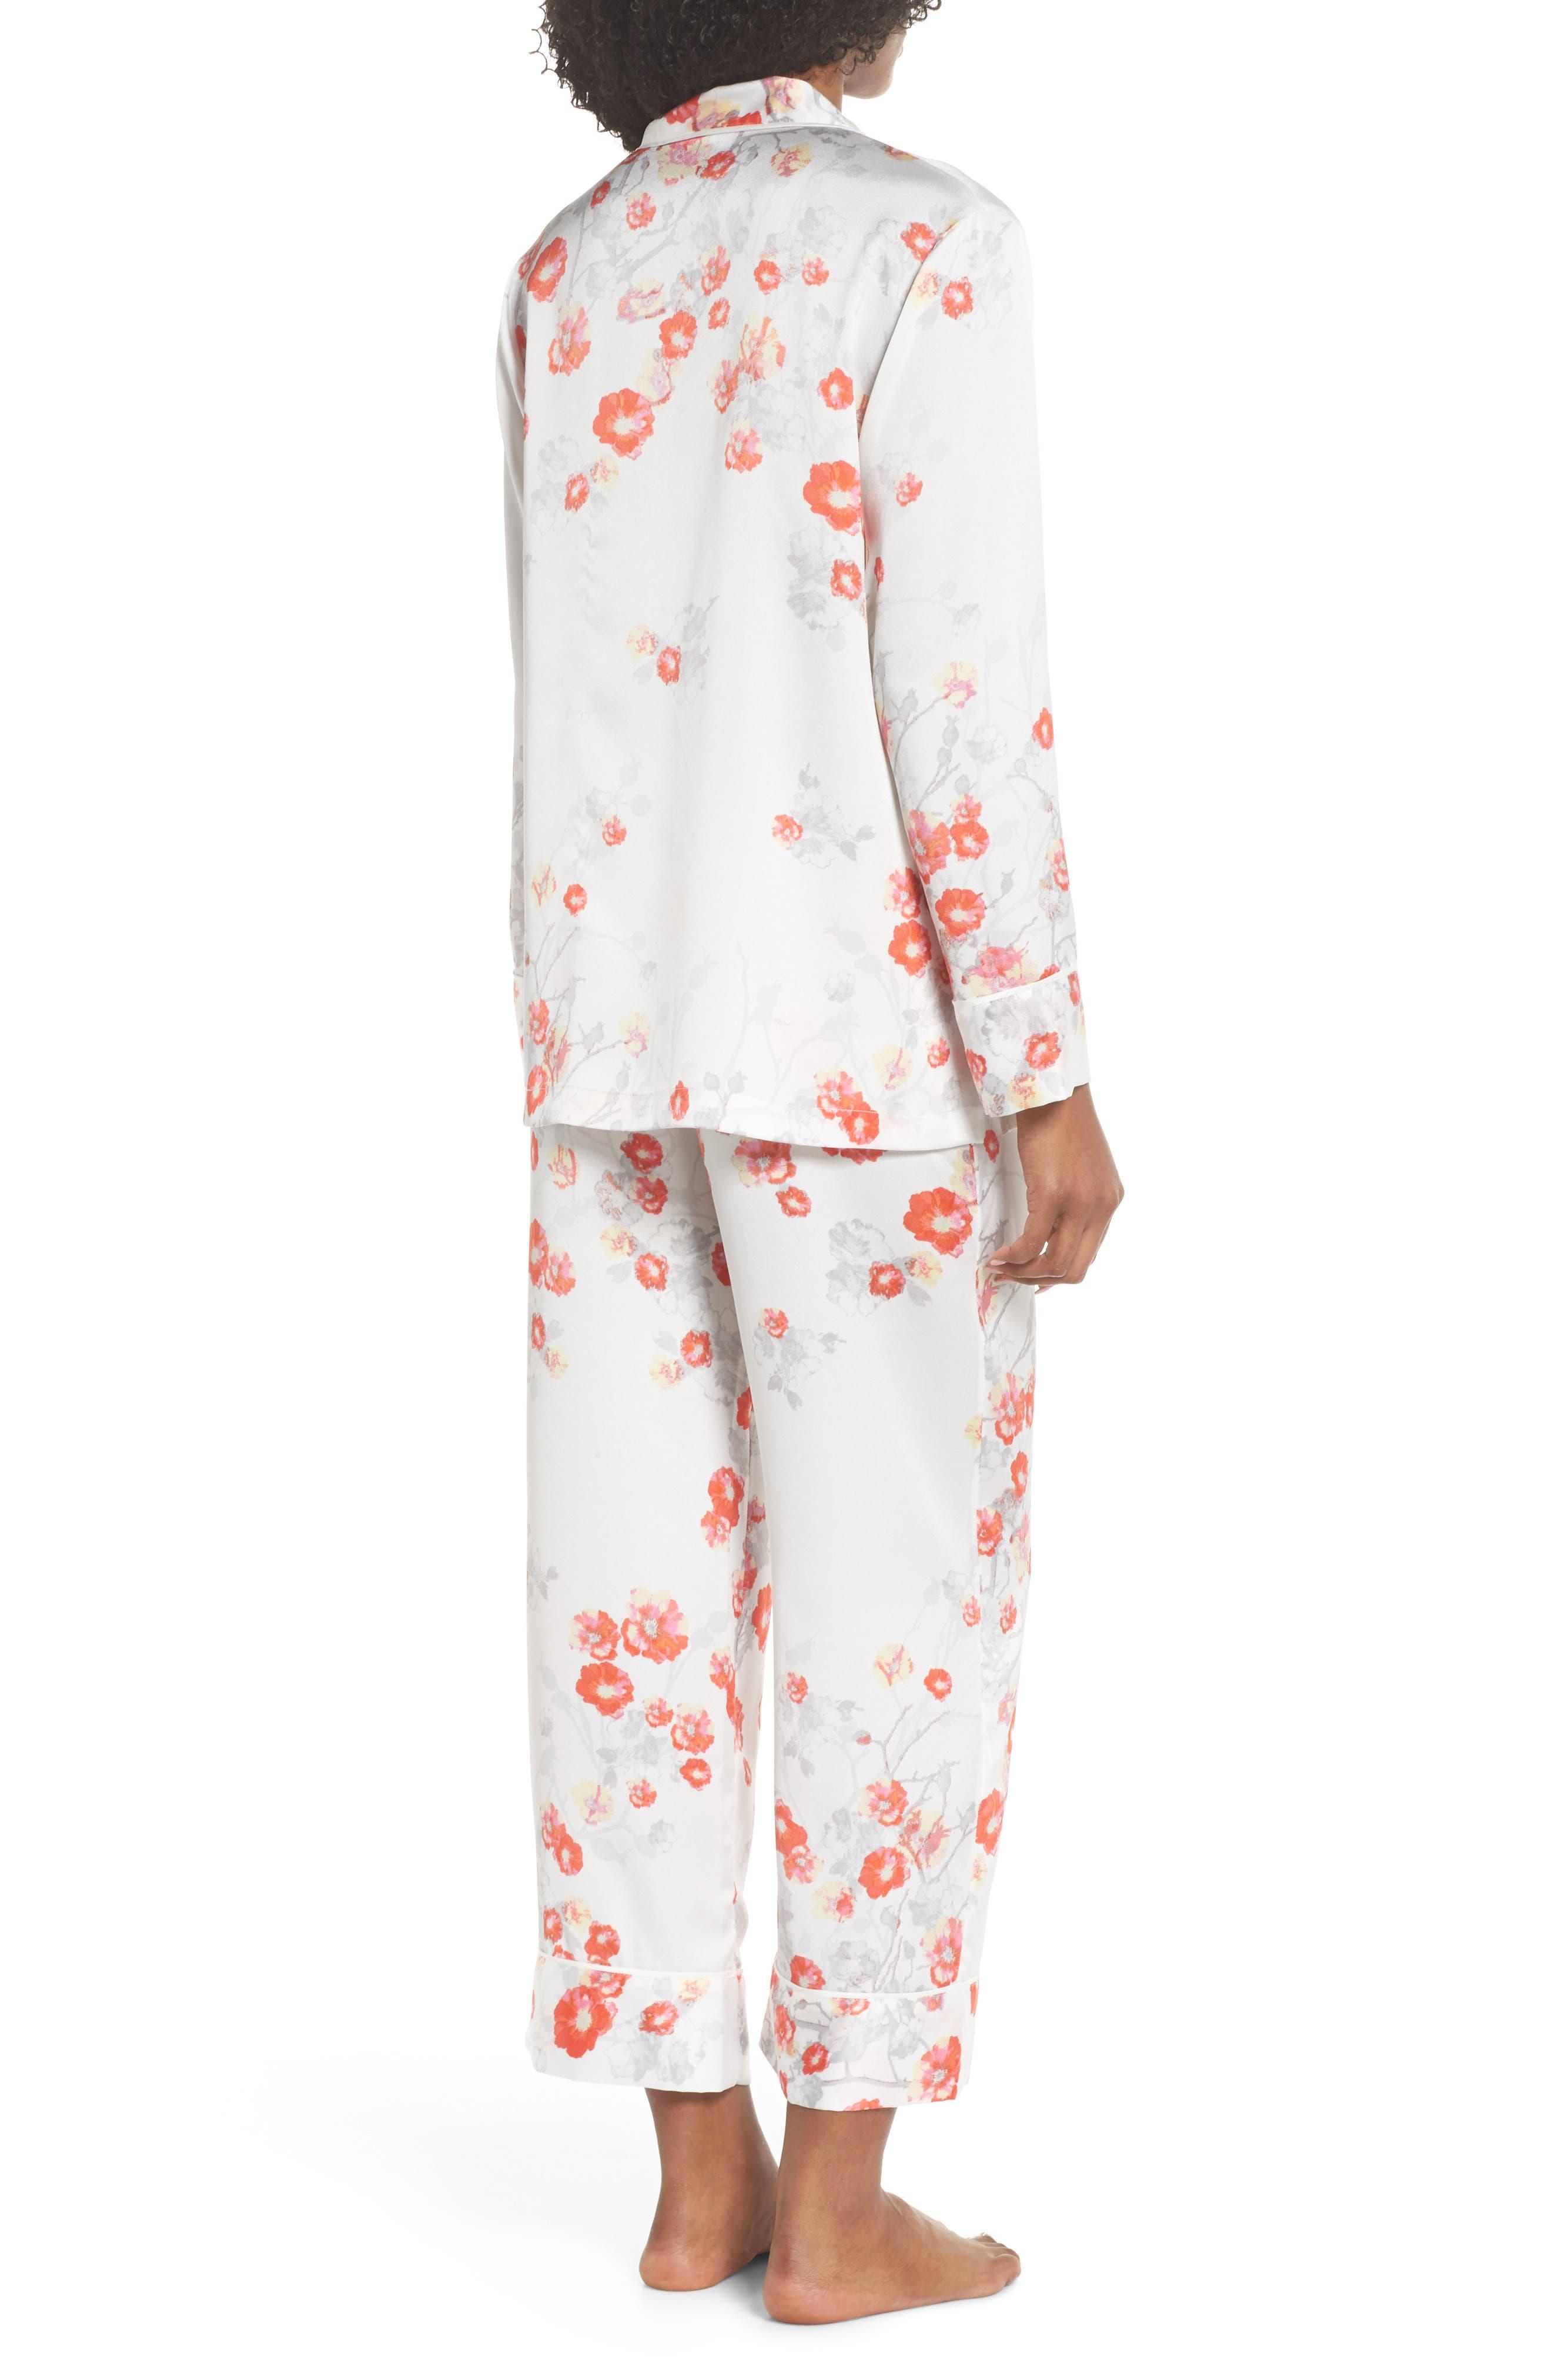 Blossom Print Satin Pajamas,                             Alternate thumbnail 2, color,                             905